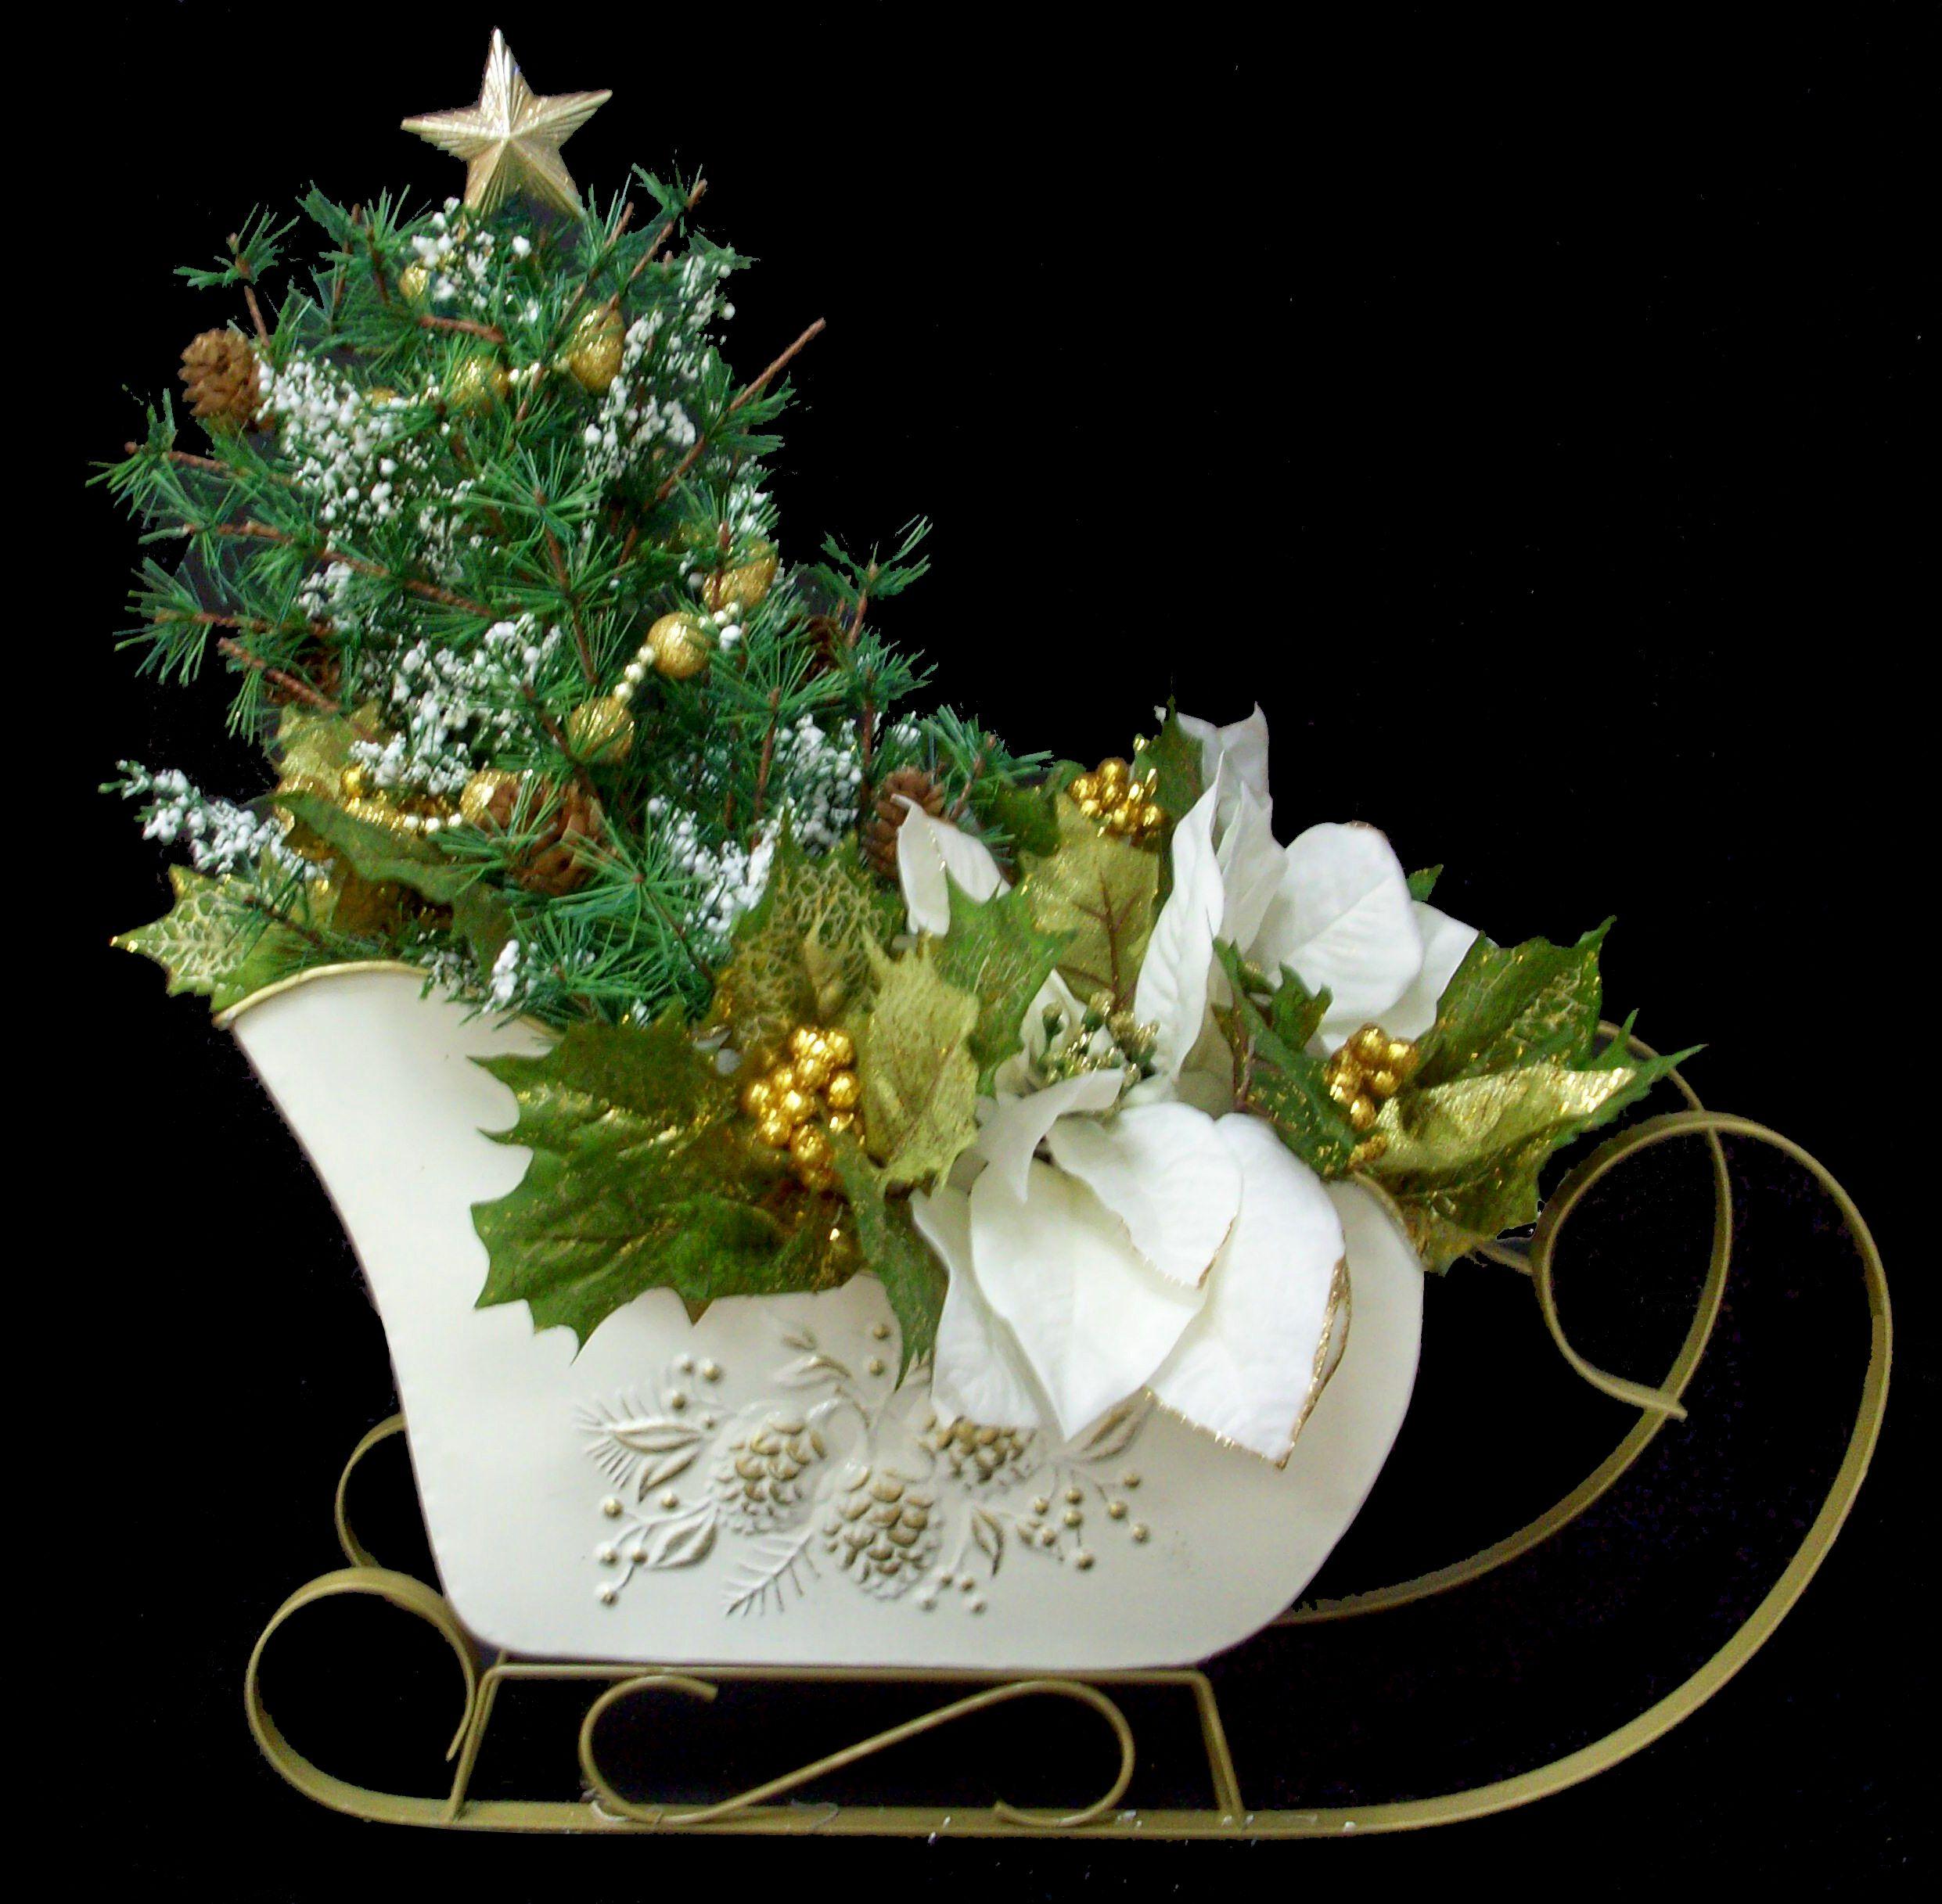 Christmas Tree Store Erie Pa: Winter White Sled Designed By Karen B., A.C. Moore Erie